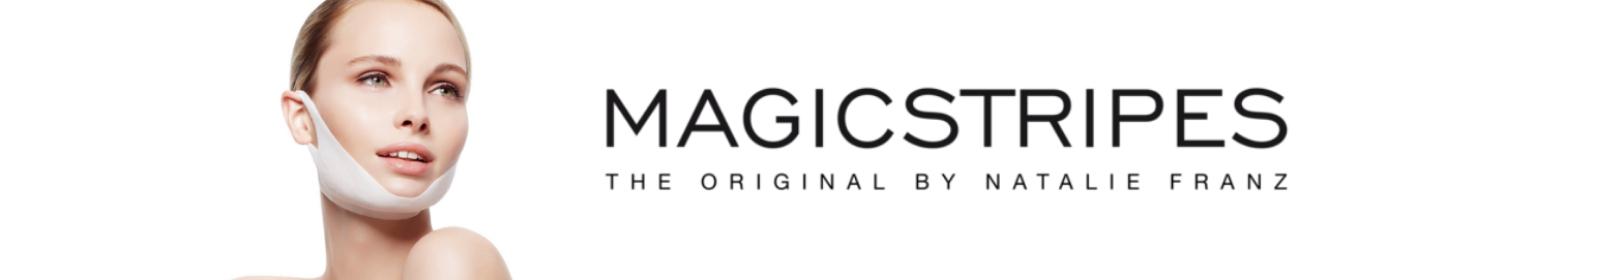 cosmetice/ingrijire-ten magicstripes